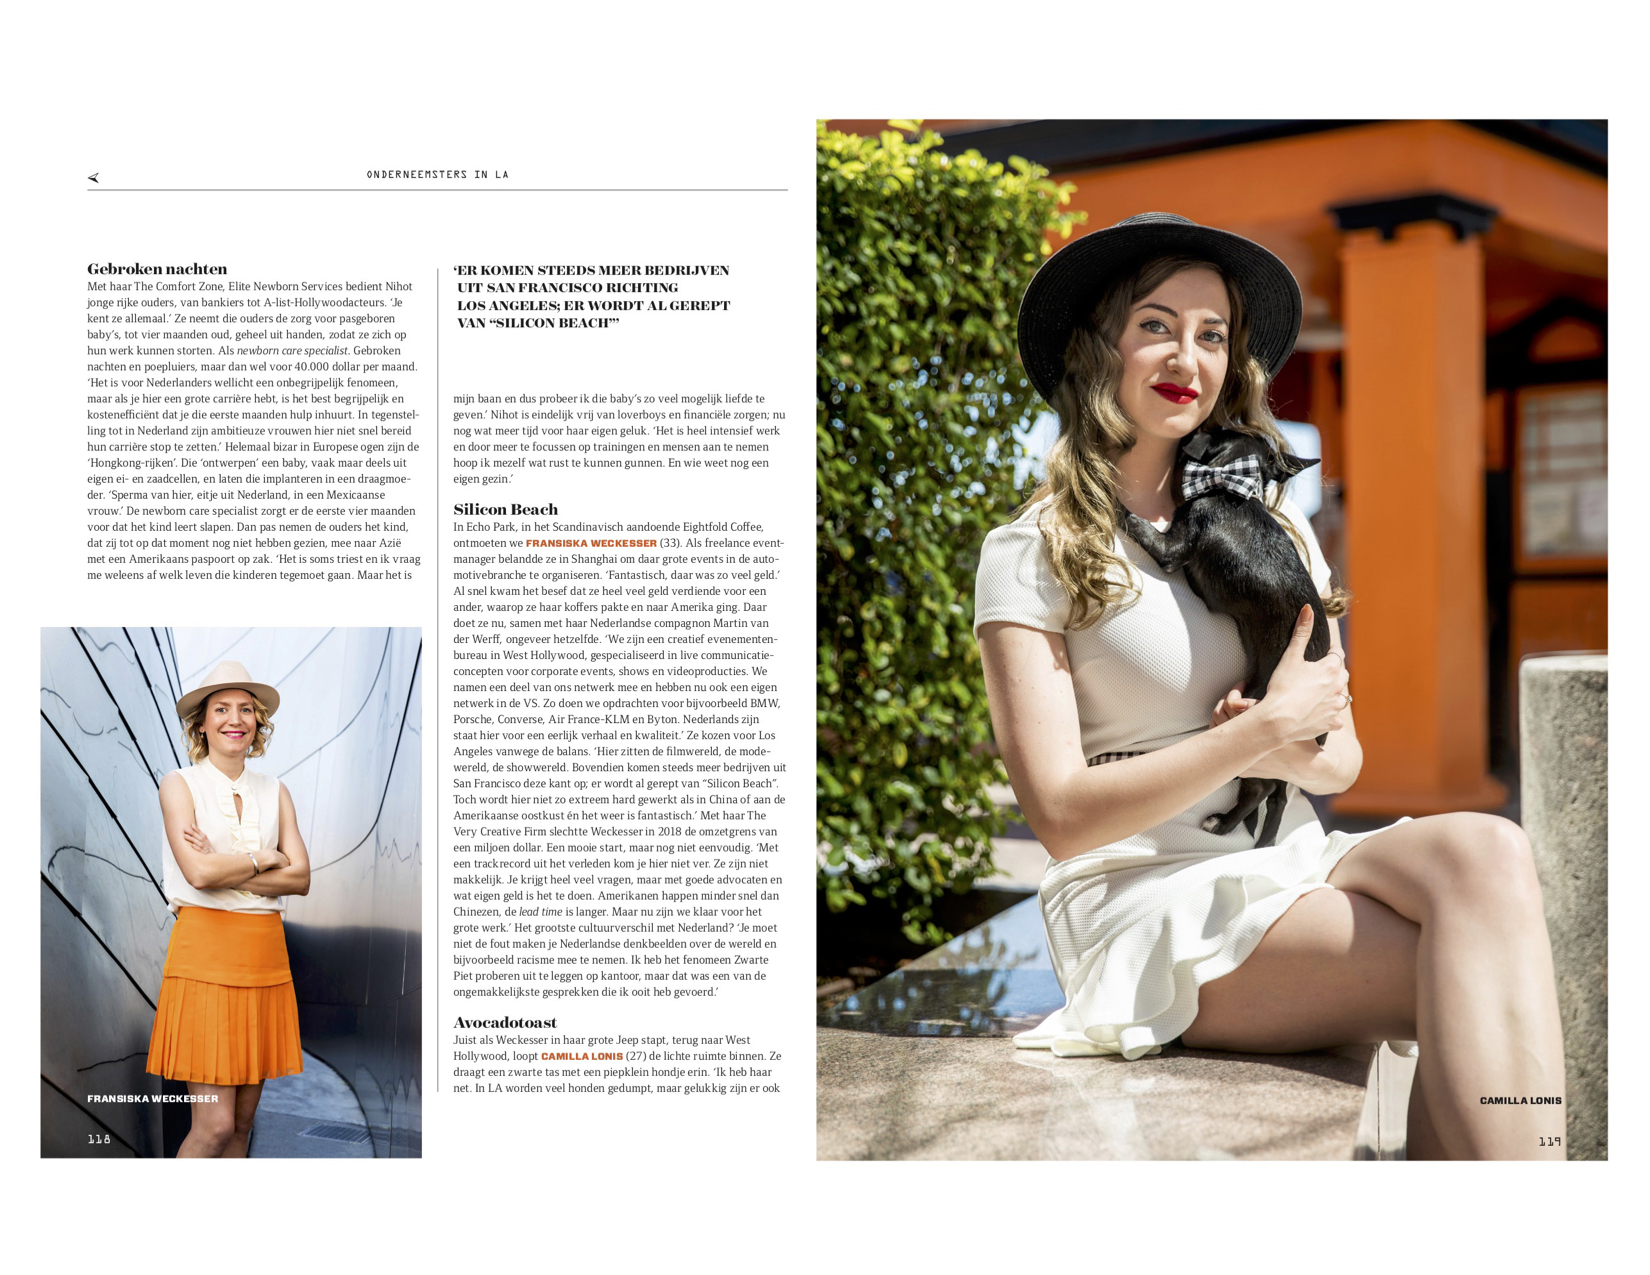 Dutch entrepeneurs for QUOTE magazine.